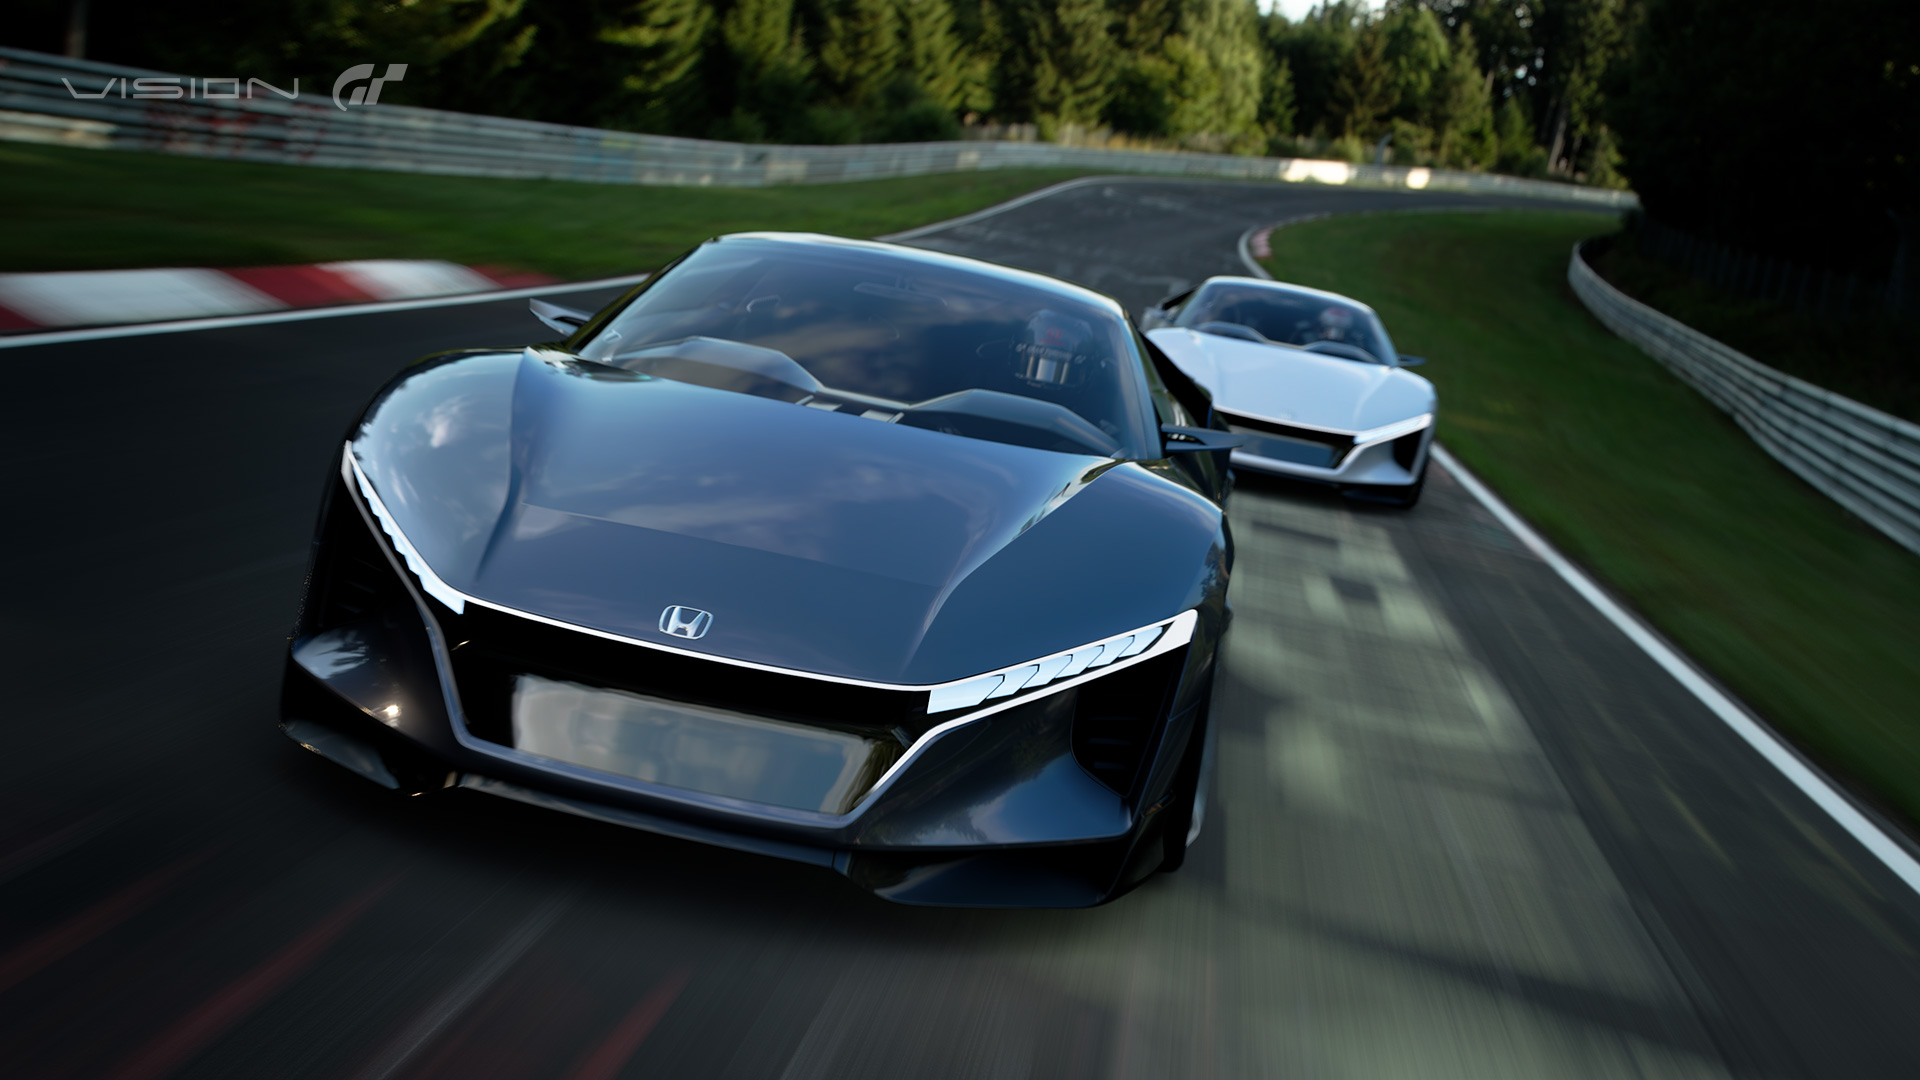 Honda Sports Vision Gran Turismo sports car concept revealed in full